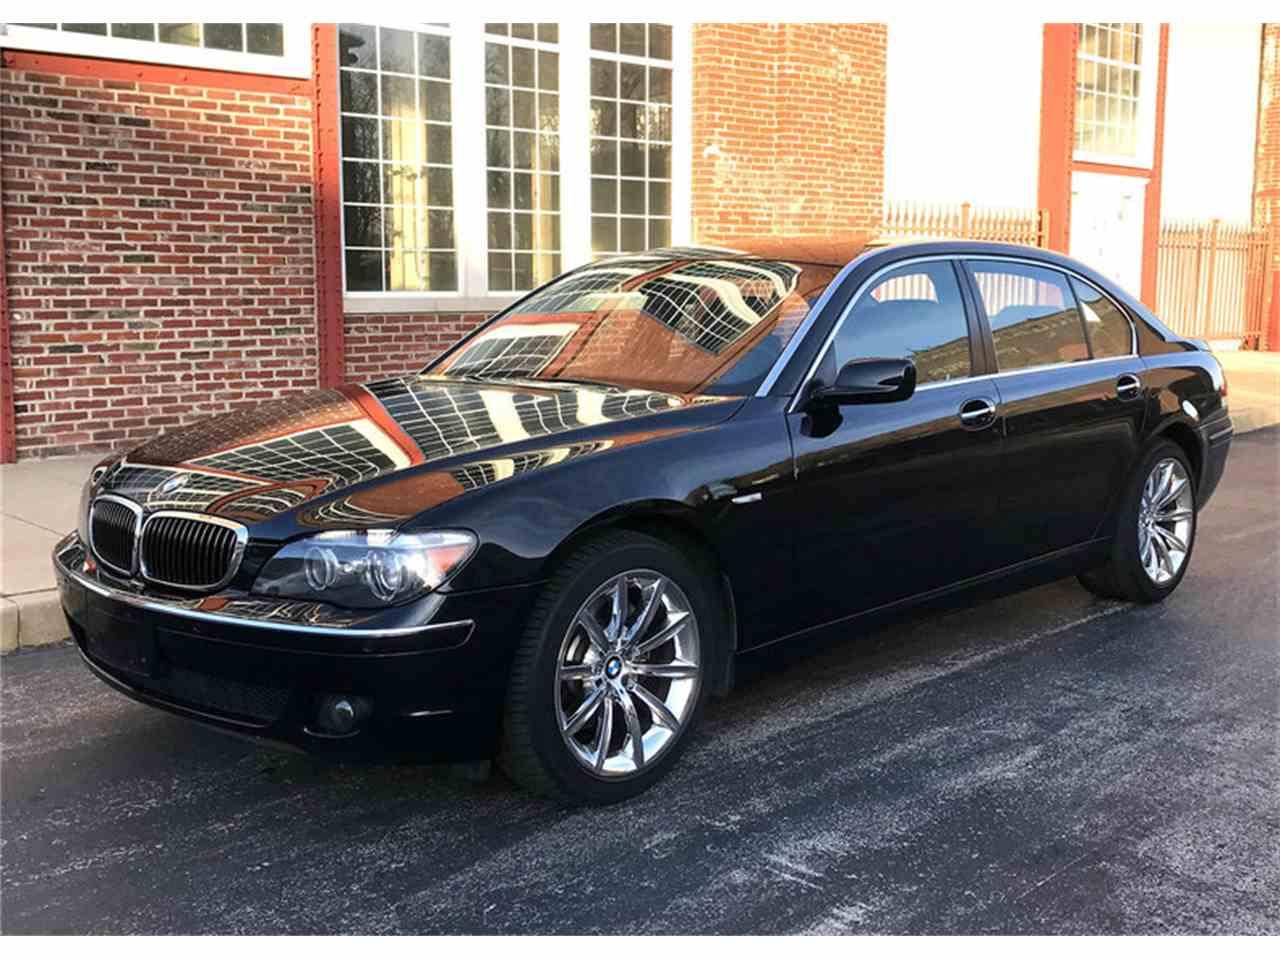 2008 BMW 750li for Sale | ClassicCars.com | CC-1066652